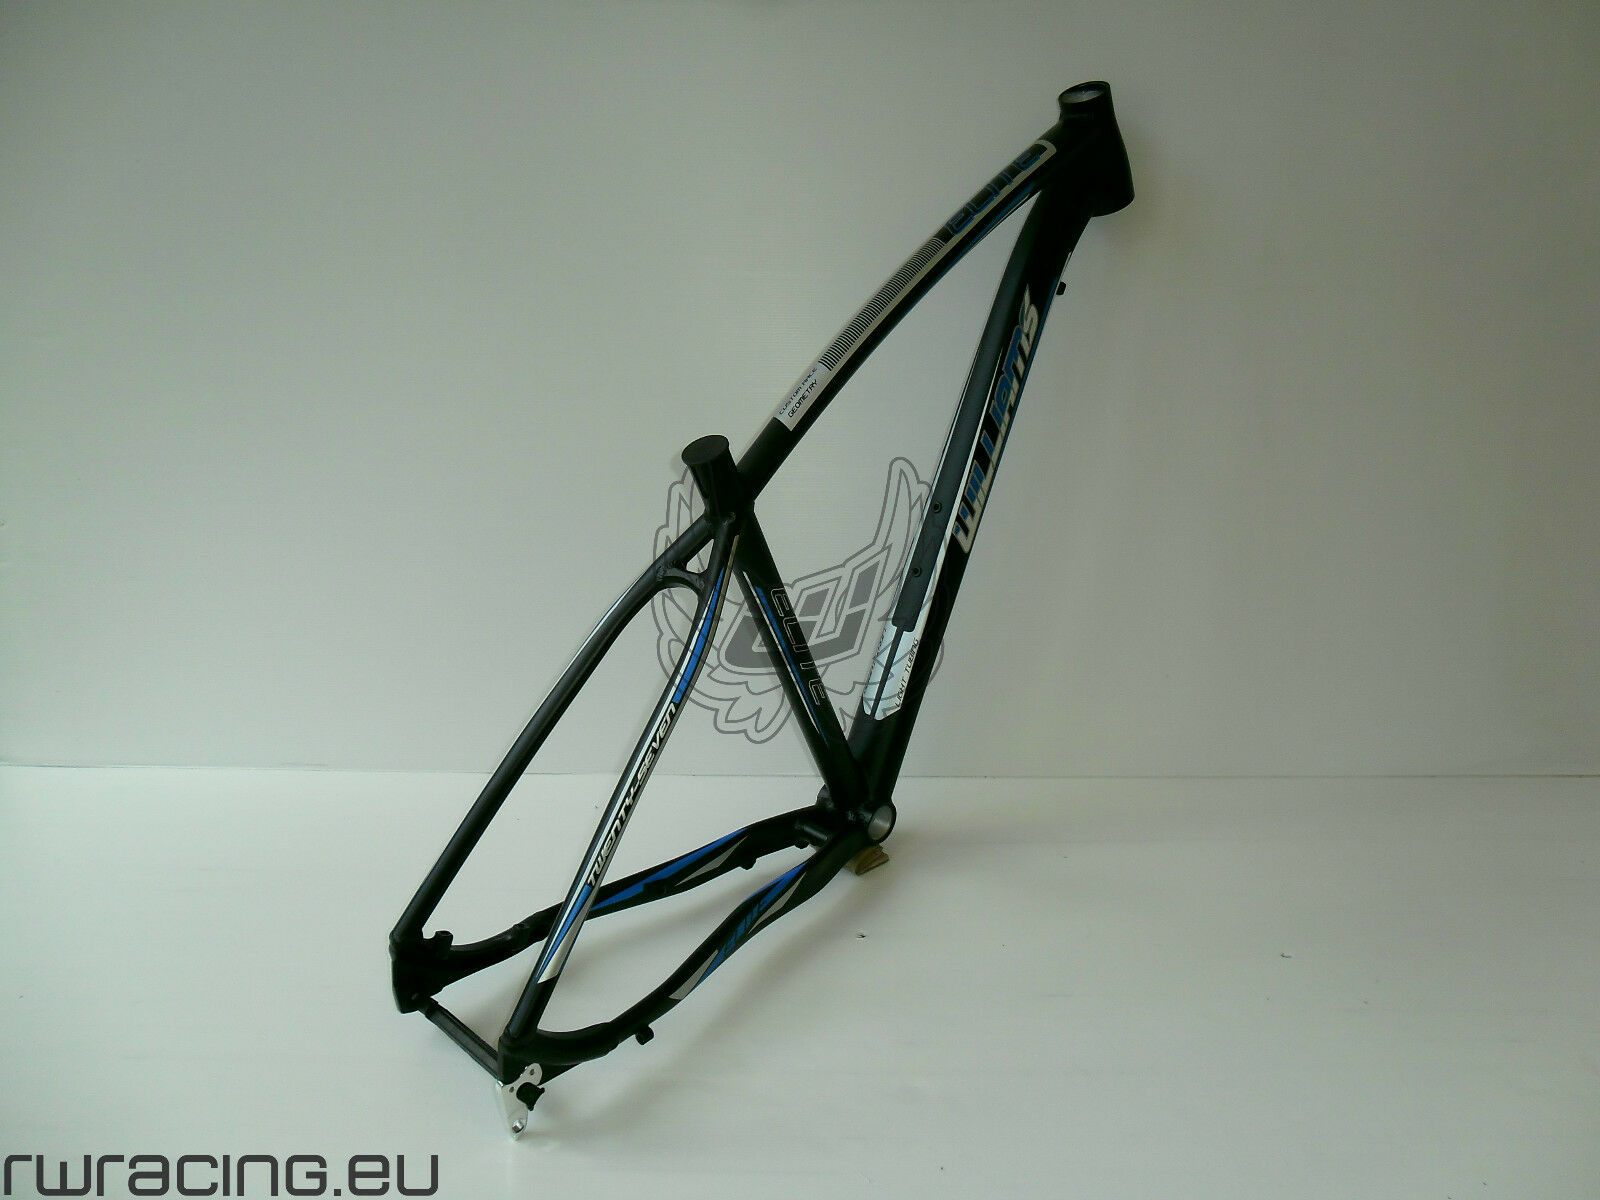 Telaio mtb 27.5 per bici   xc   crosscountry alluminio Williams black   blue